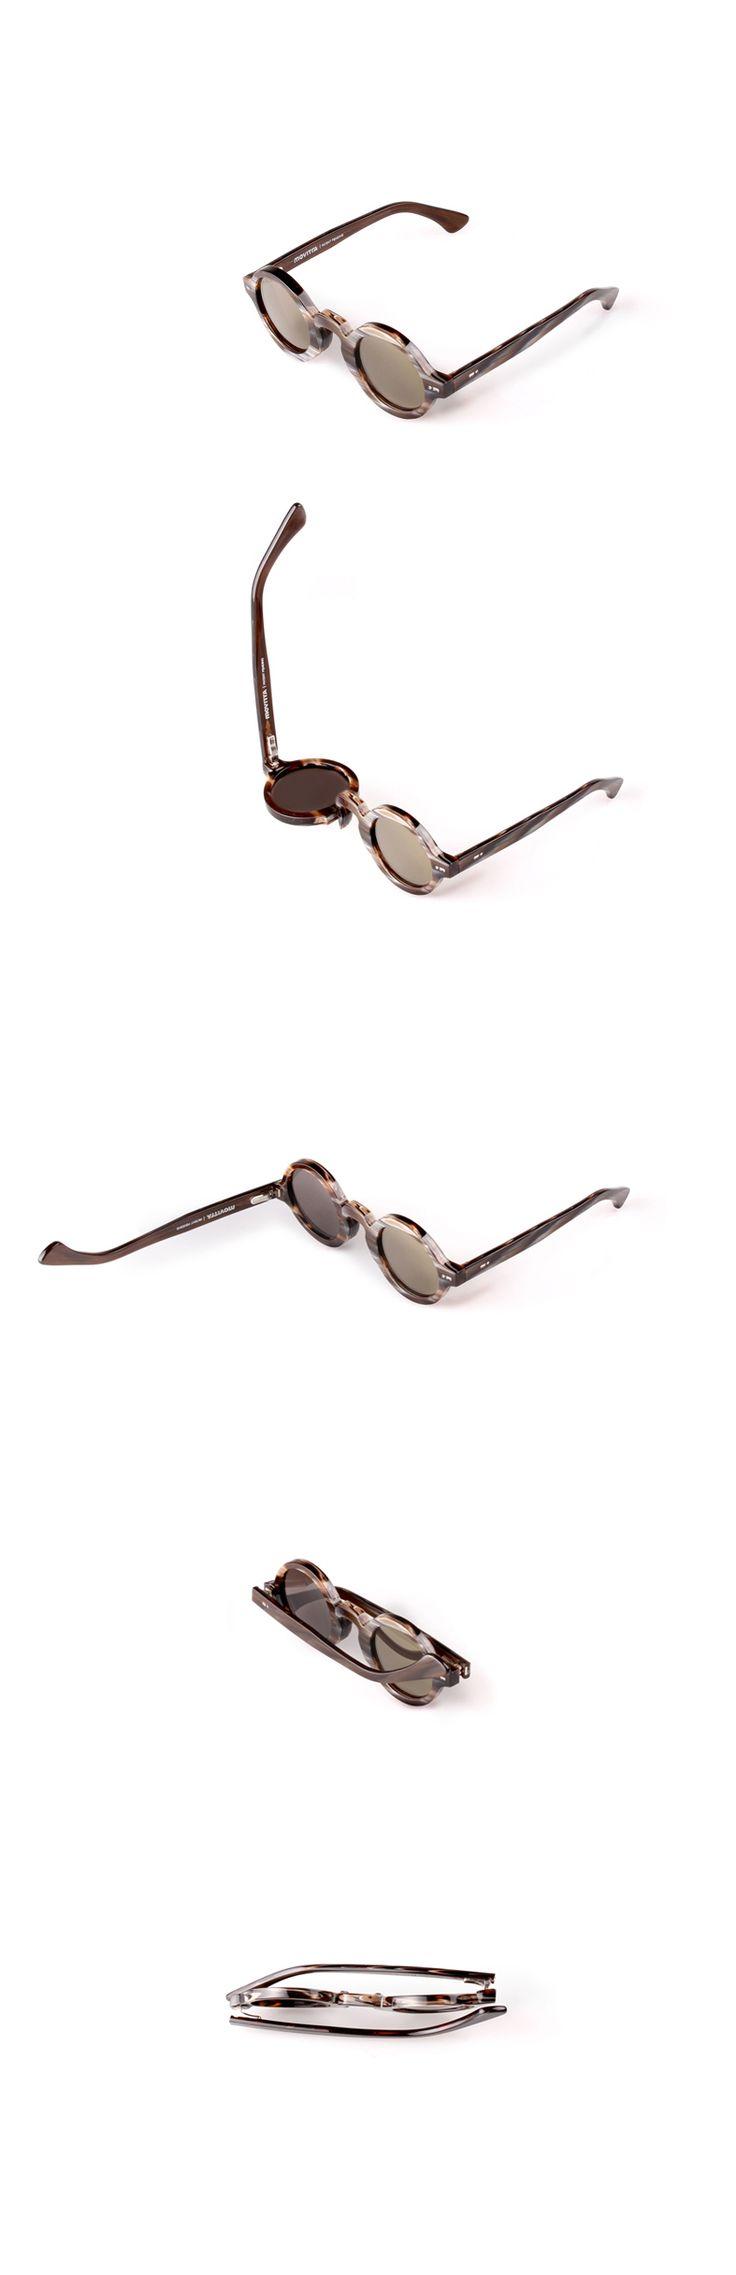 Movitra 215 - Corno scuro con lente flash bronze #sunglasses #movitra #movitraspectacles #spectacles #glasses #eyewear